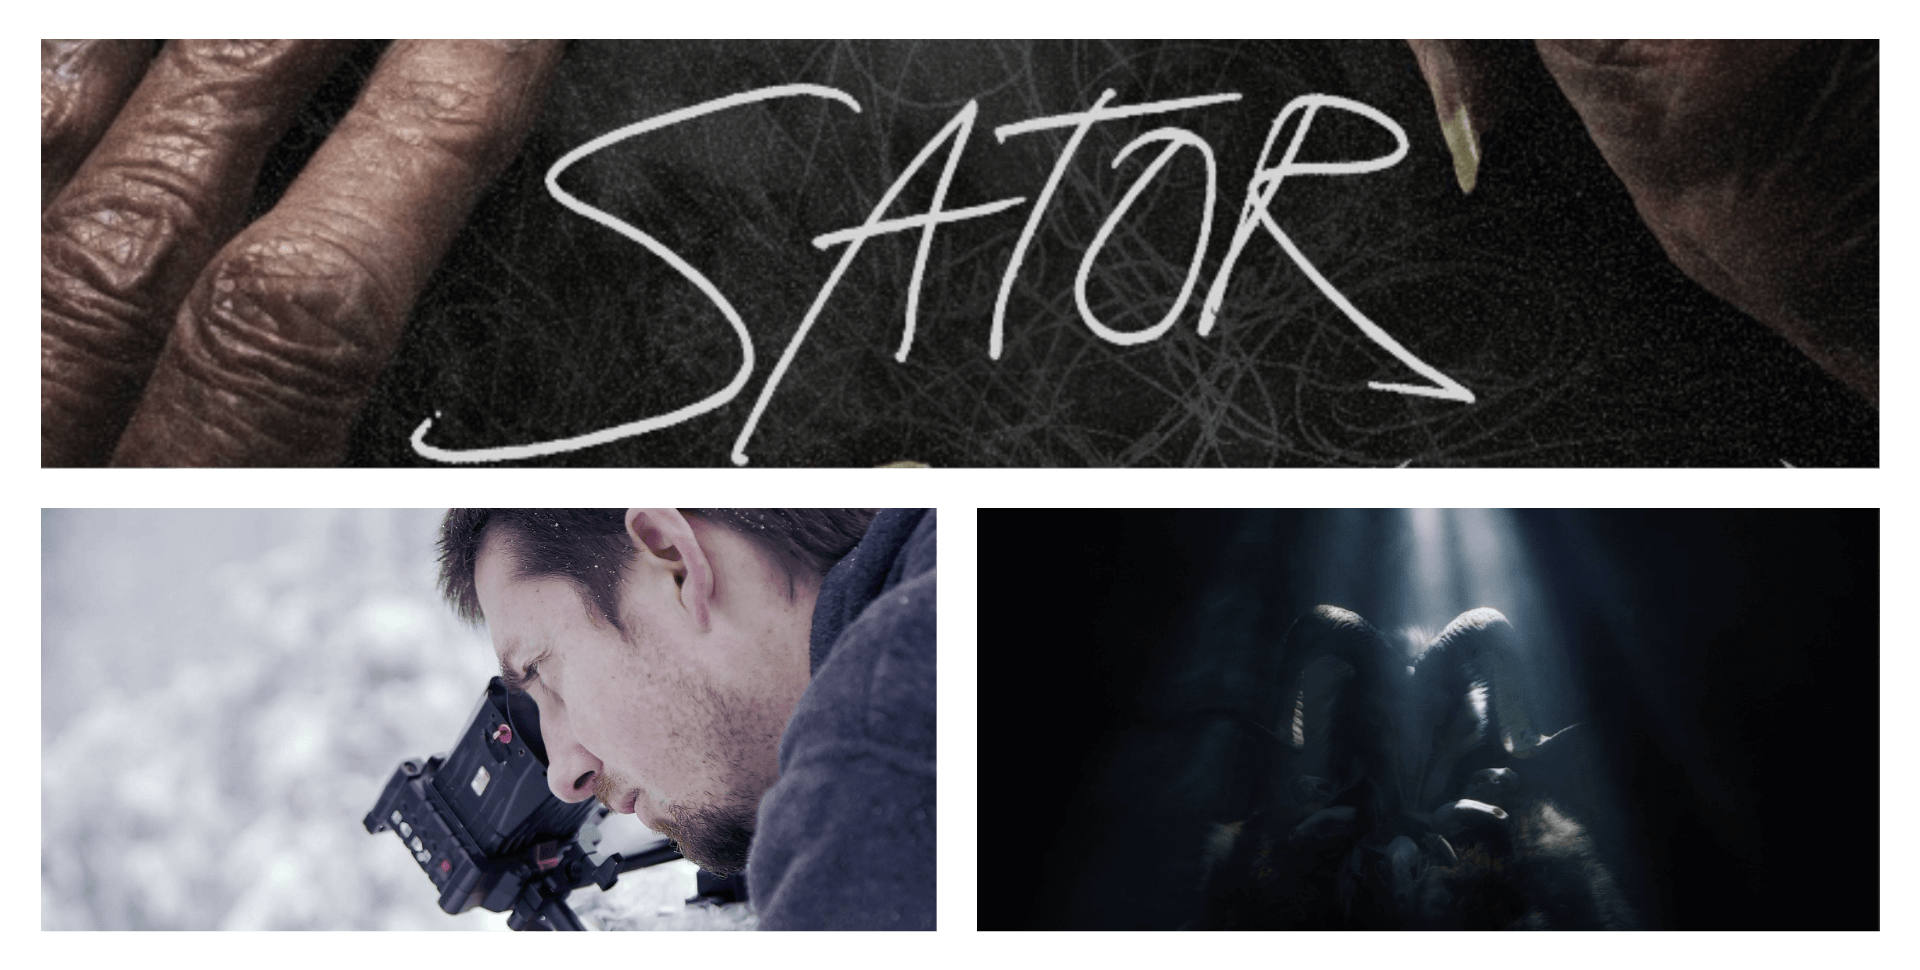 Interview with 'Sator' Director/Writer Jordan Graham